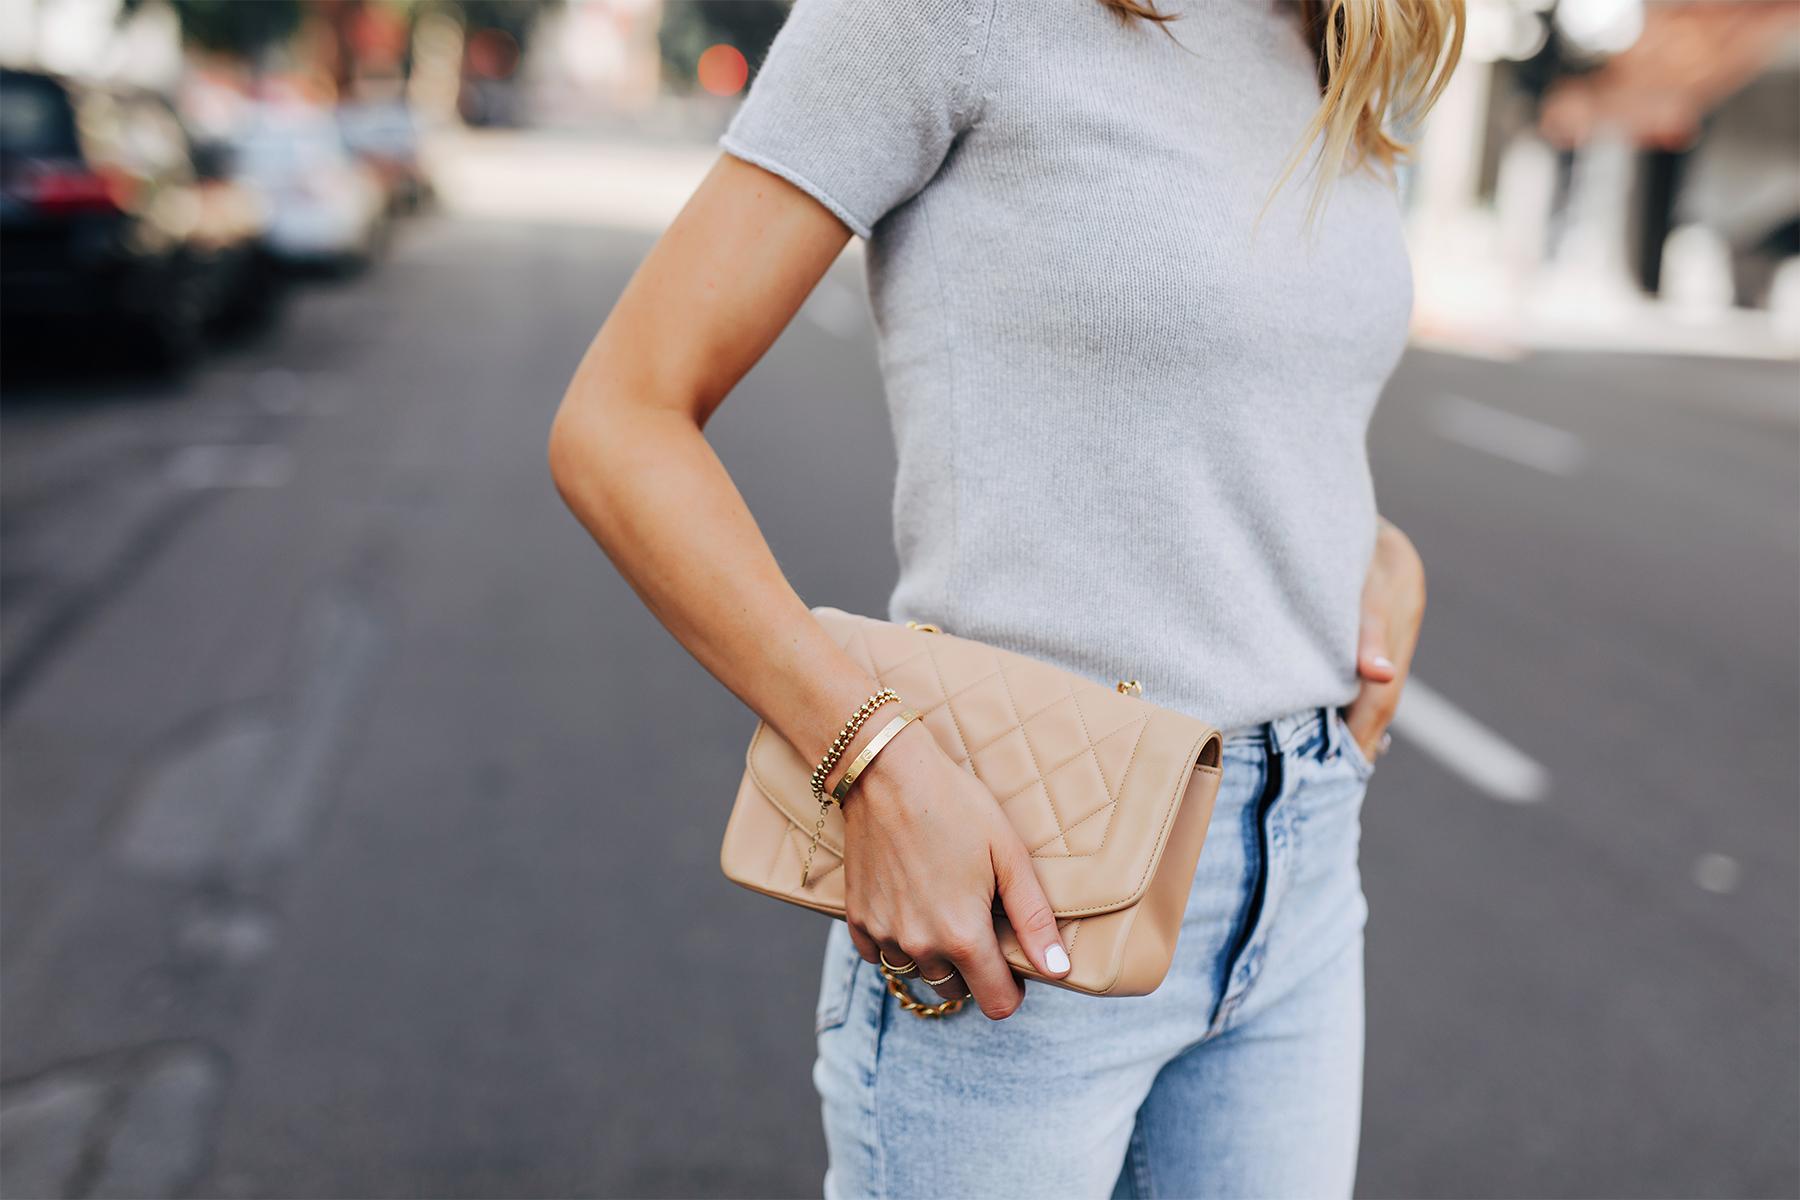 Fashion Jackson Wearing Theory Tolleree Grey Short Sleeve Sweater Beige Chanel Handbag Light Wash Jeans